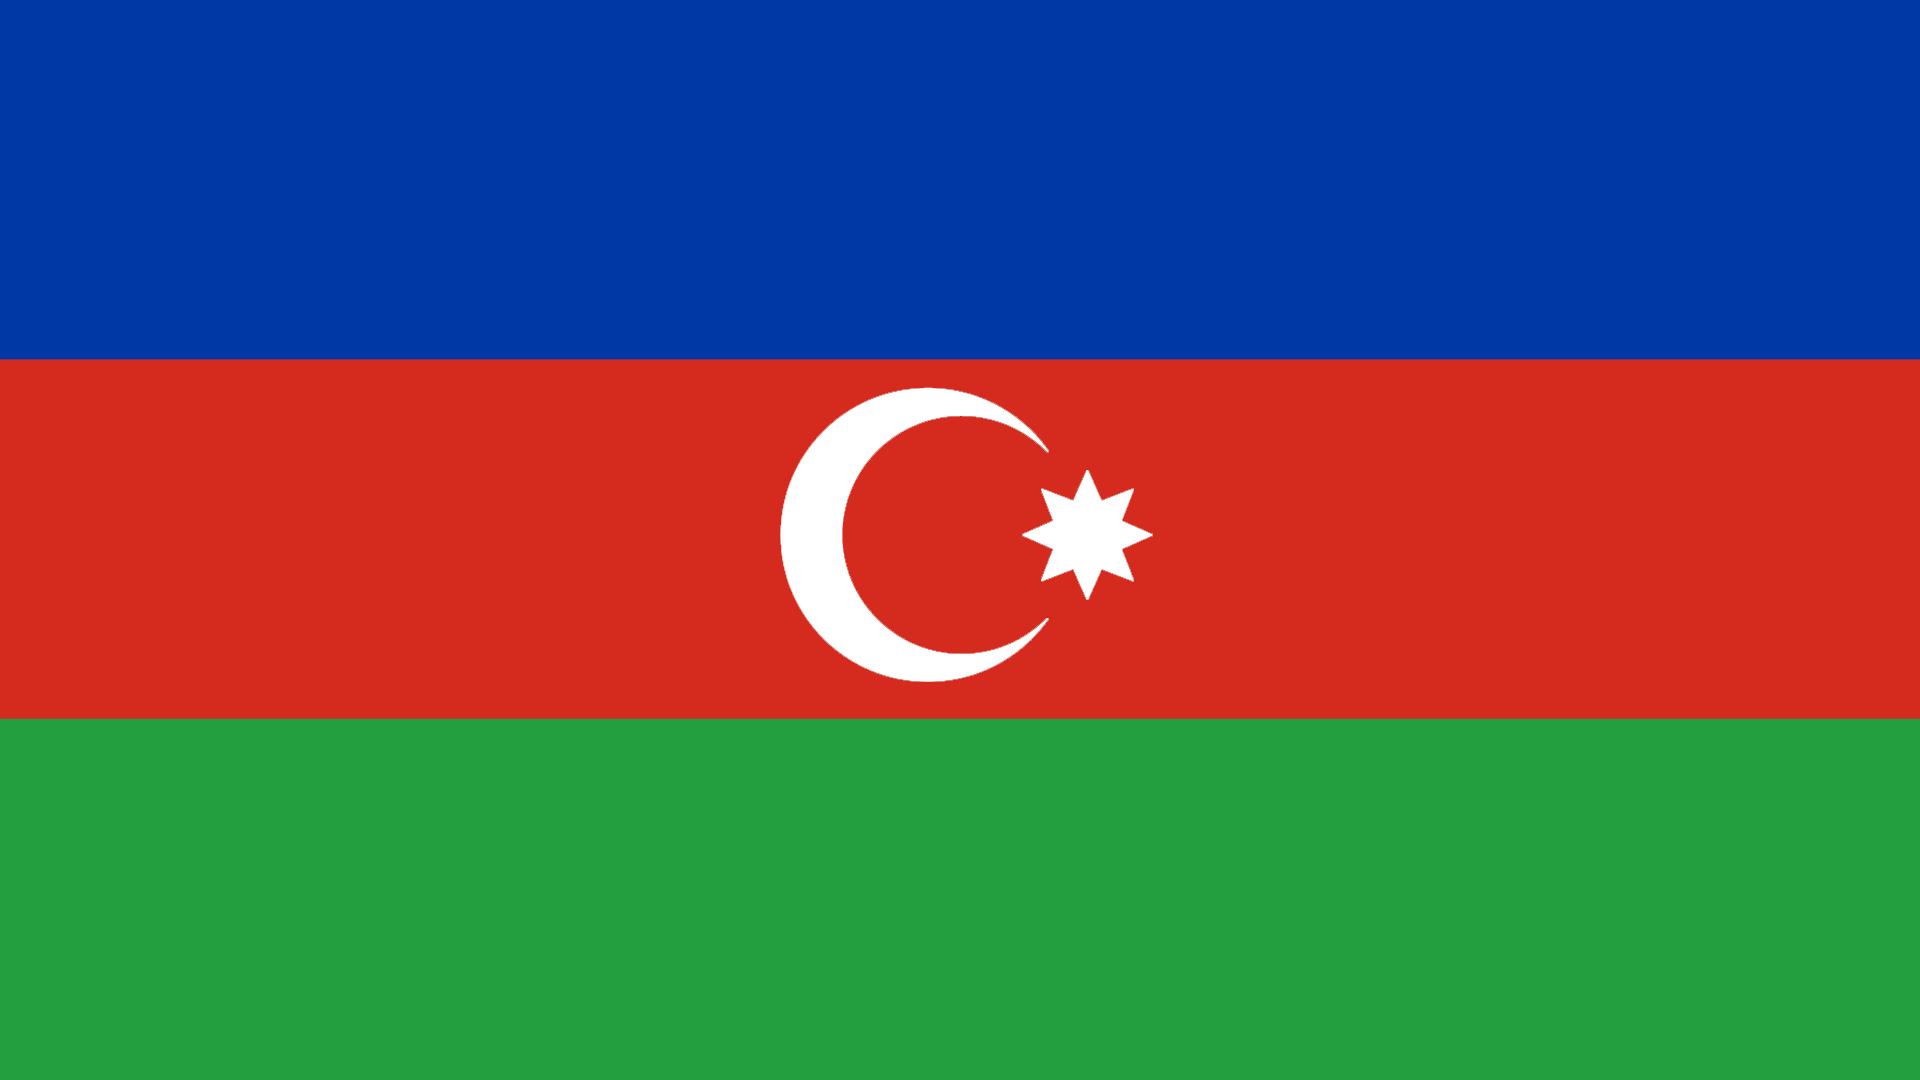 Azerbaijan Flag   Wallpaper High Definition High Quality Widescreen 1920x1080